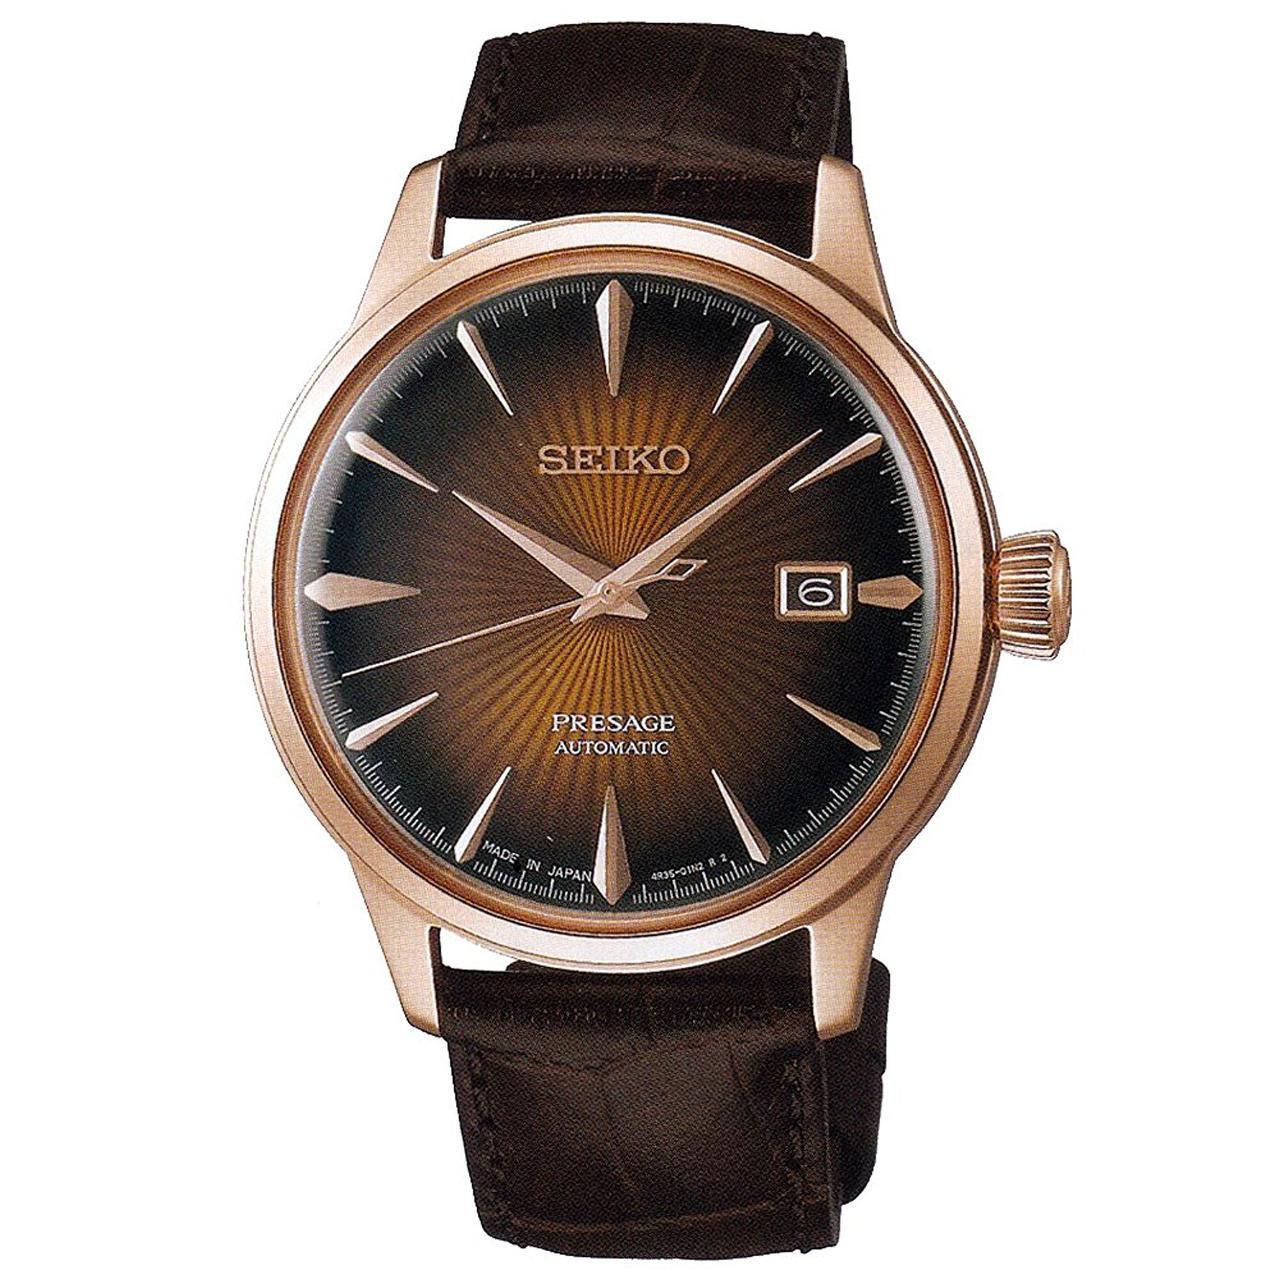 Мужские часы Seiko Presage Automatic Manhattan SARY078 -JAPAN